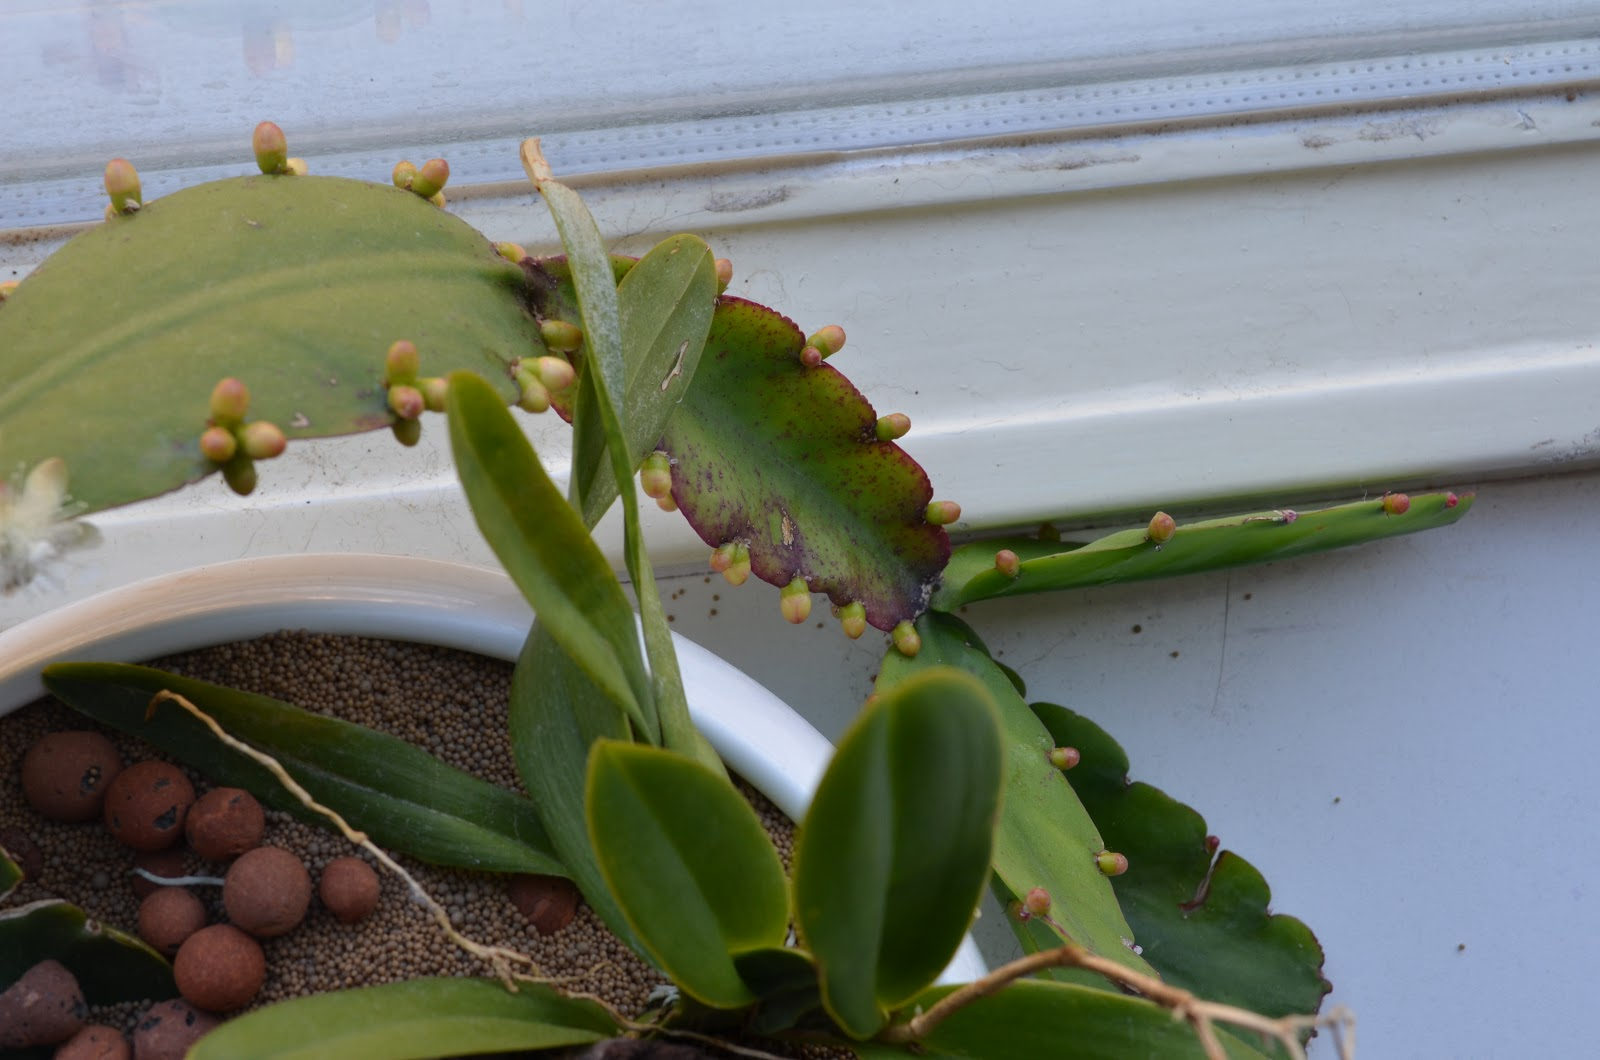 Rhipsalis Elliptica Fresh 2 x High Quality Leaf Cuttings cacti succulents plants